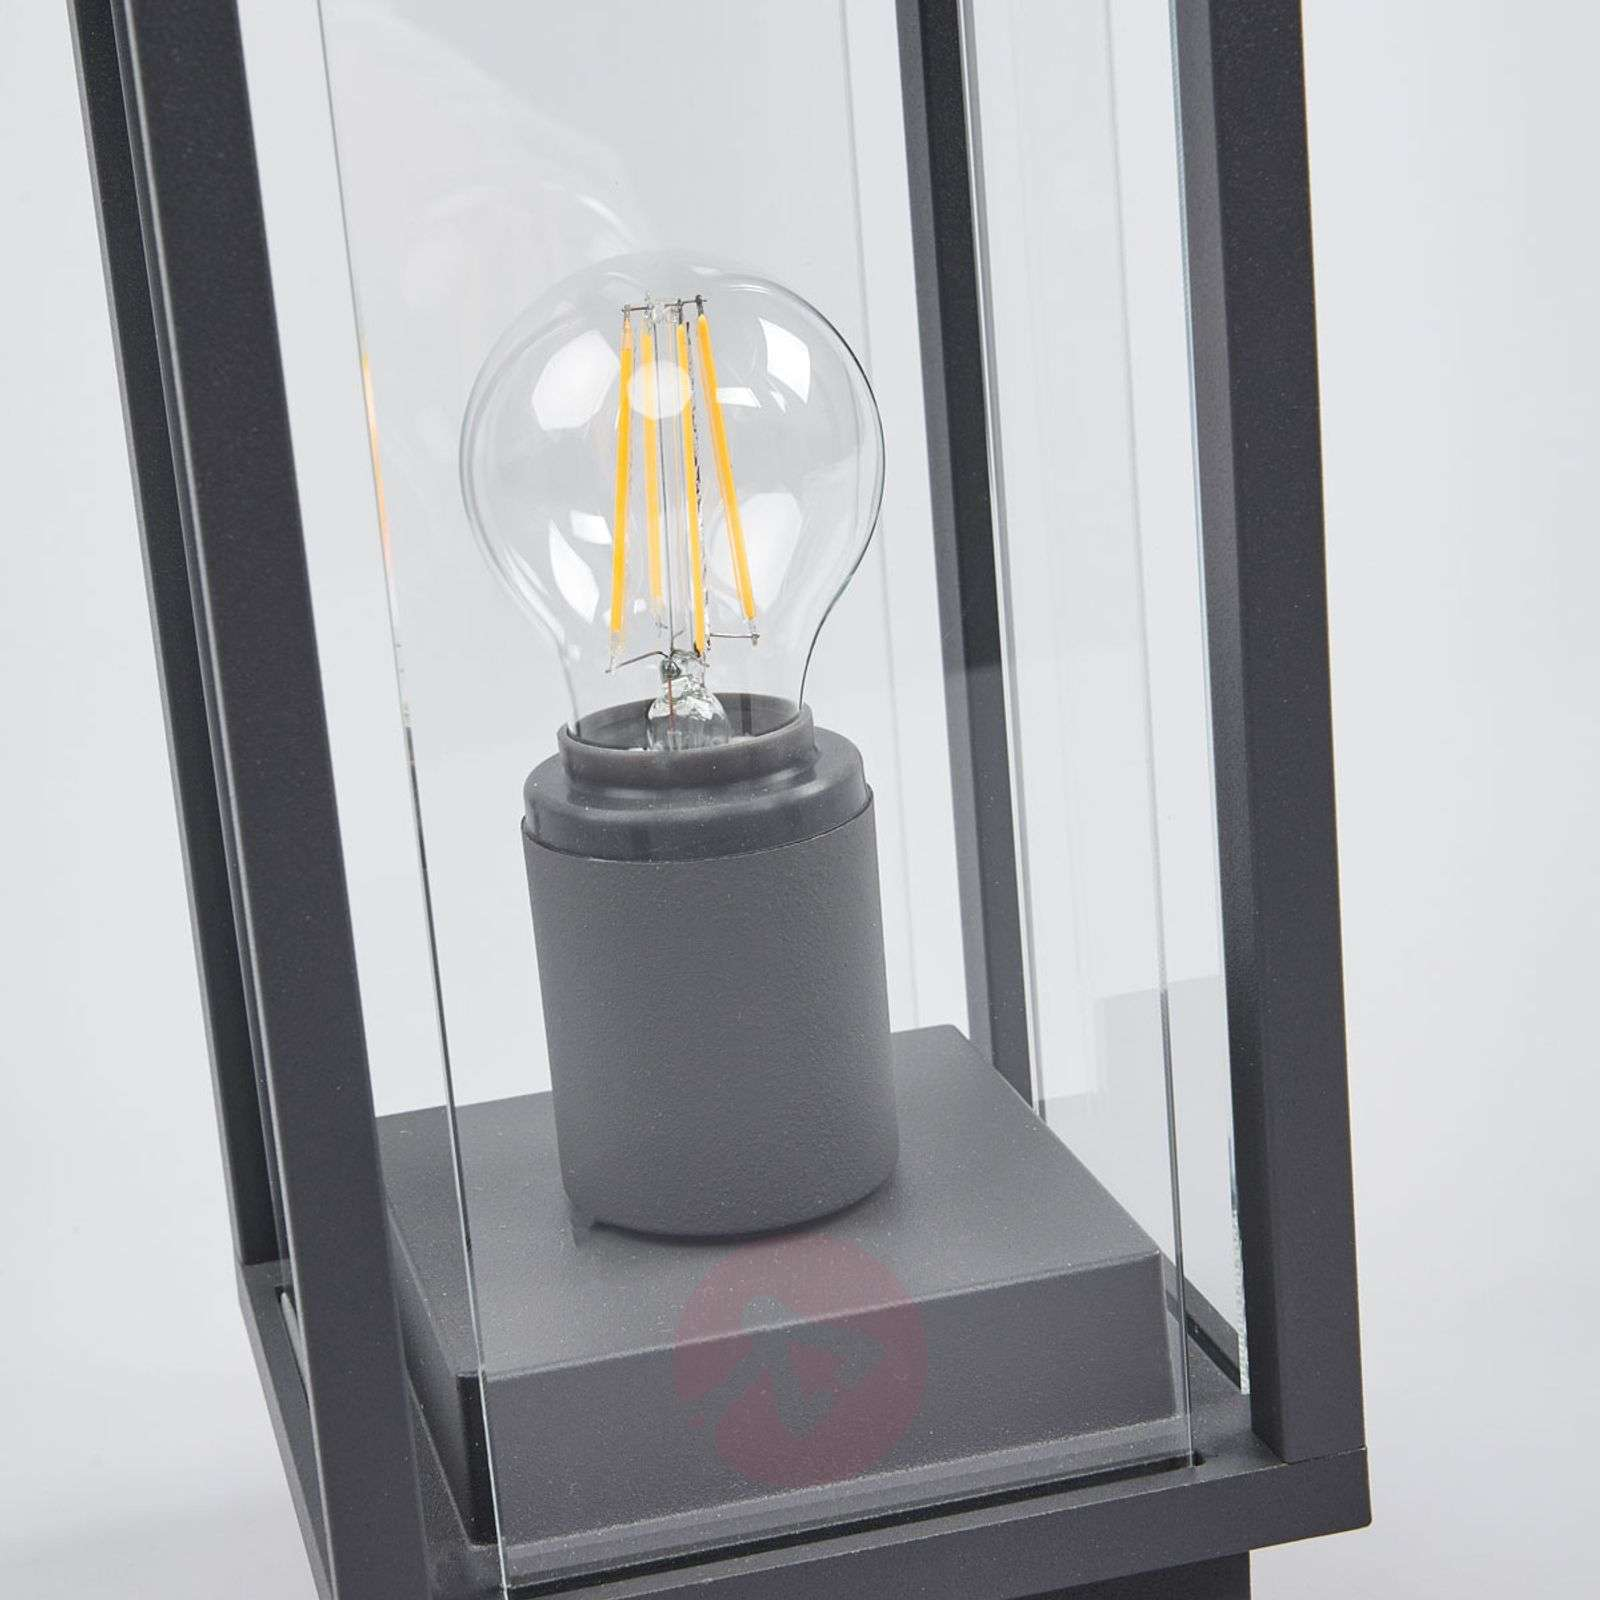 86ea419129e ... Annalea pillar light with angular shape-9616112-01 ...